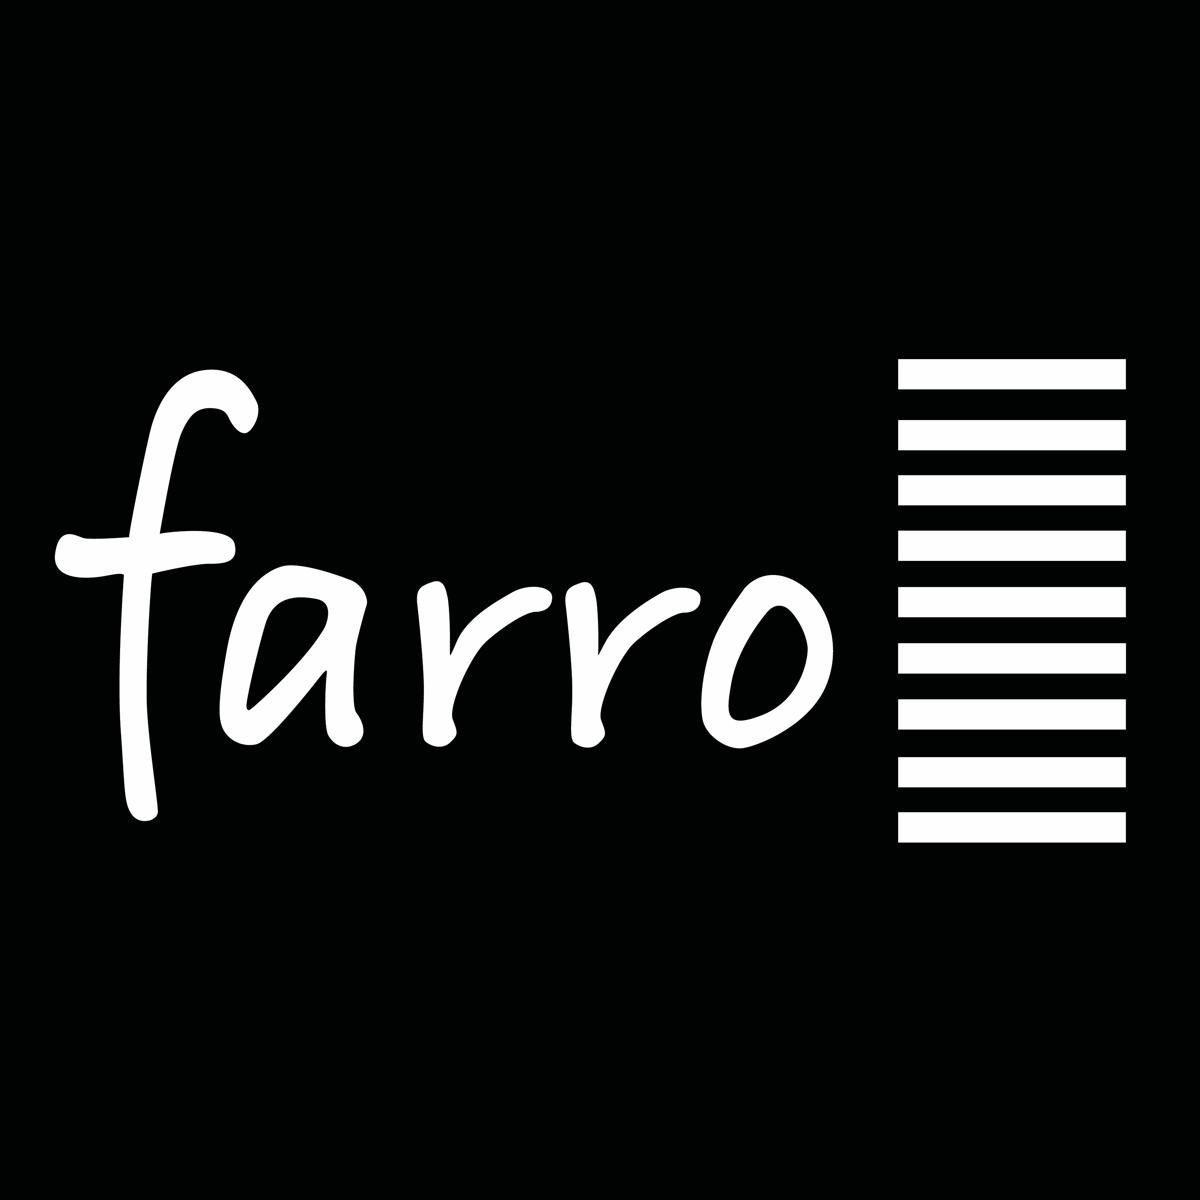 Farro Logo | Growpac